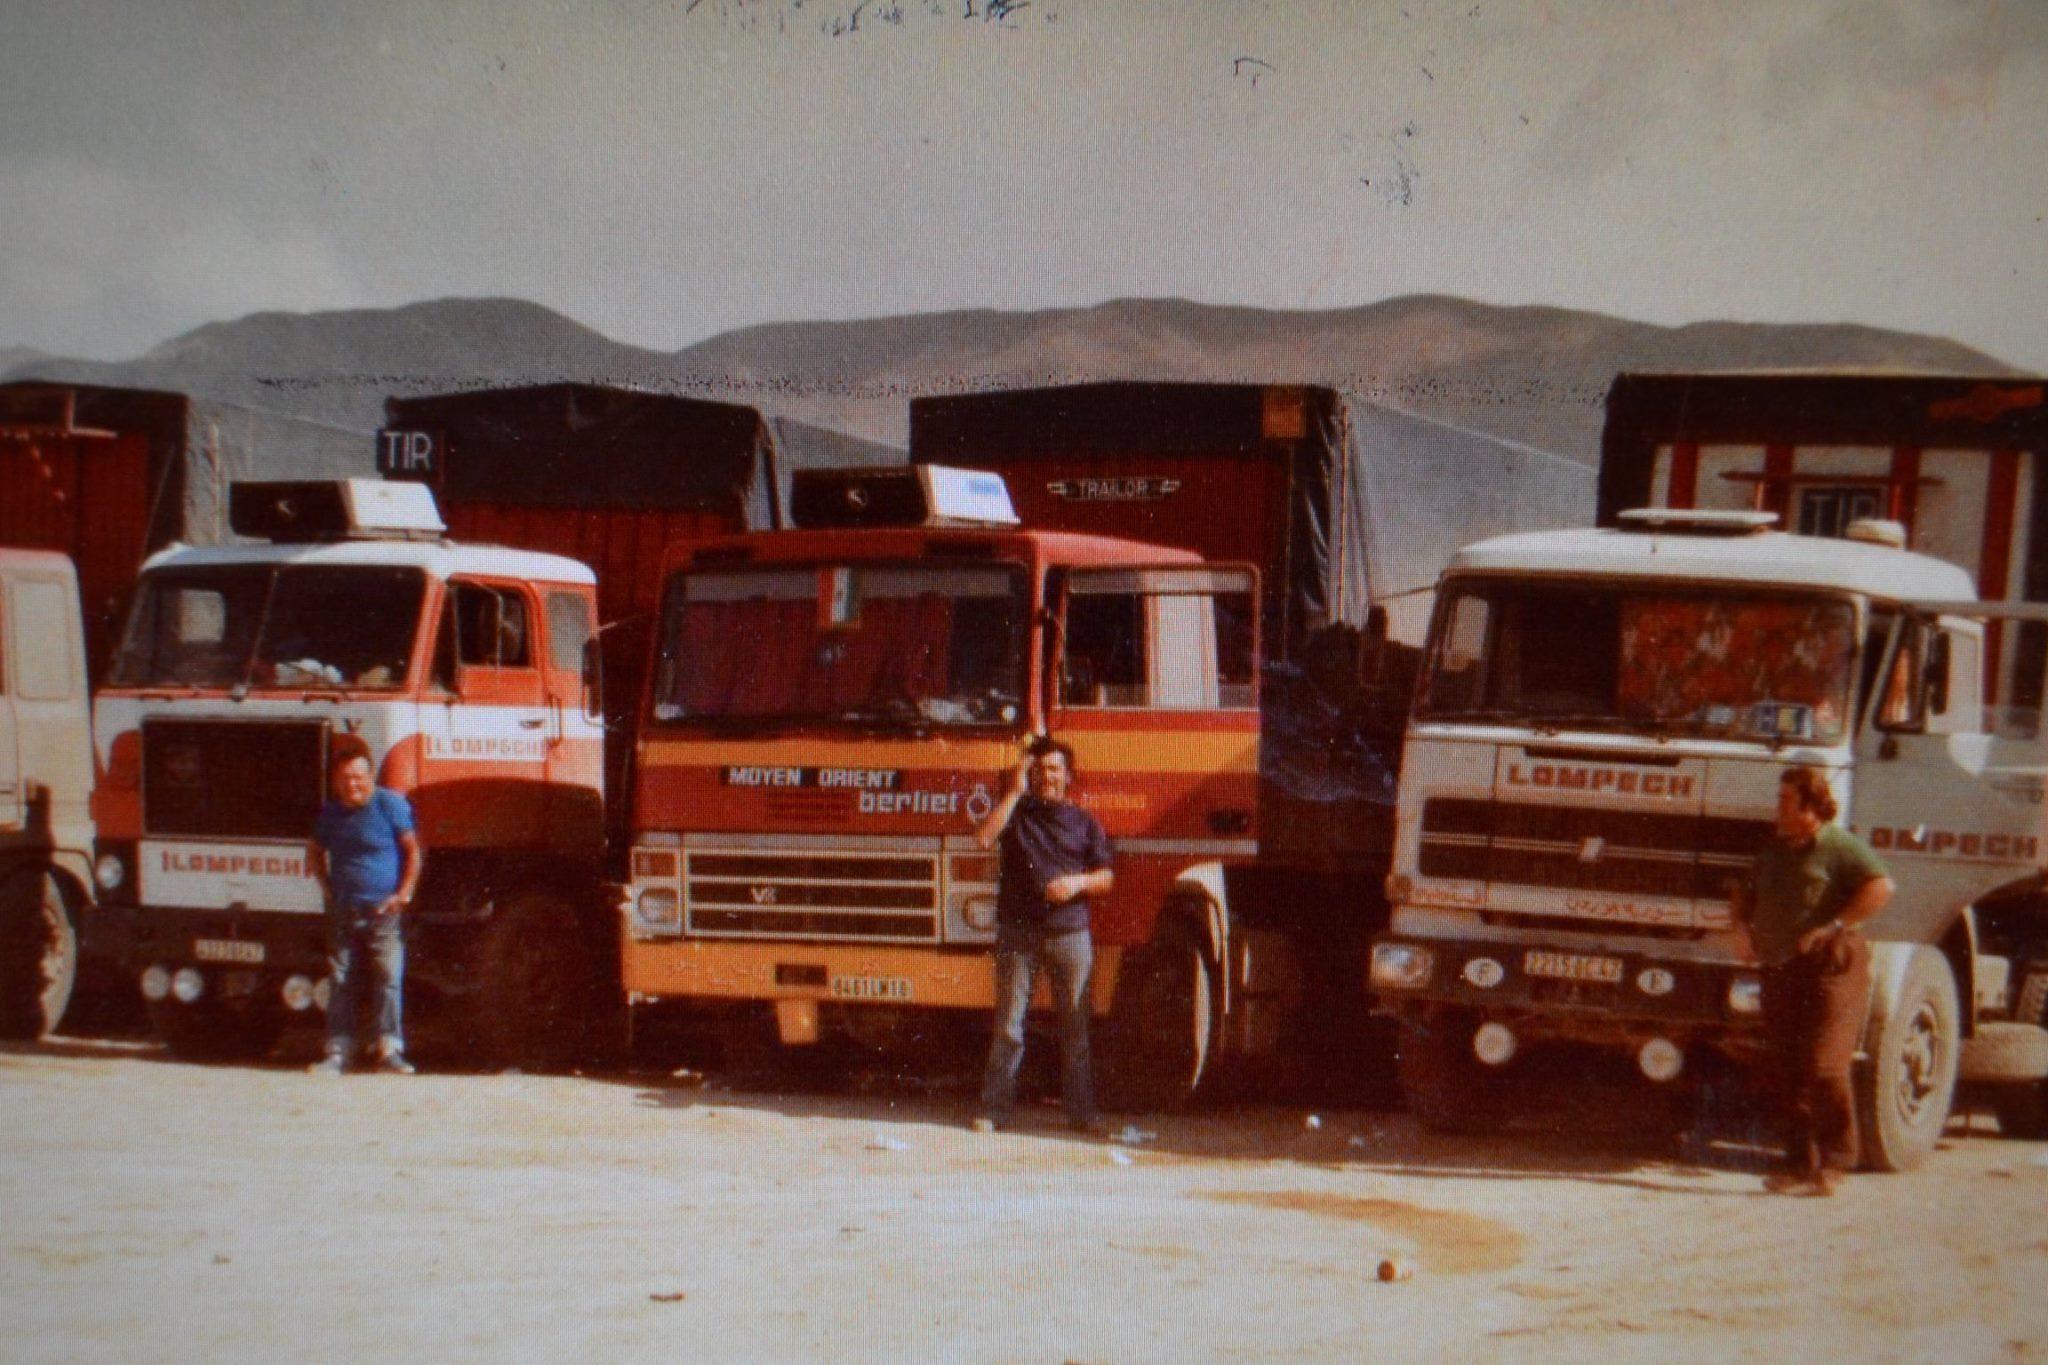 Volvo-Fiat-Lompech-Berliet-Sisternas